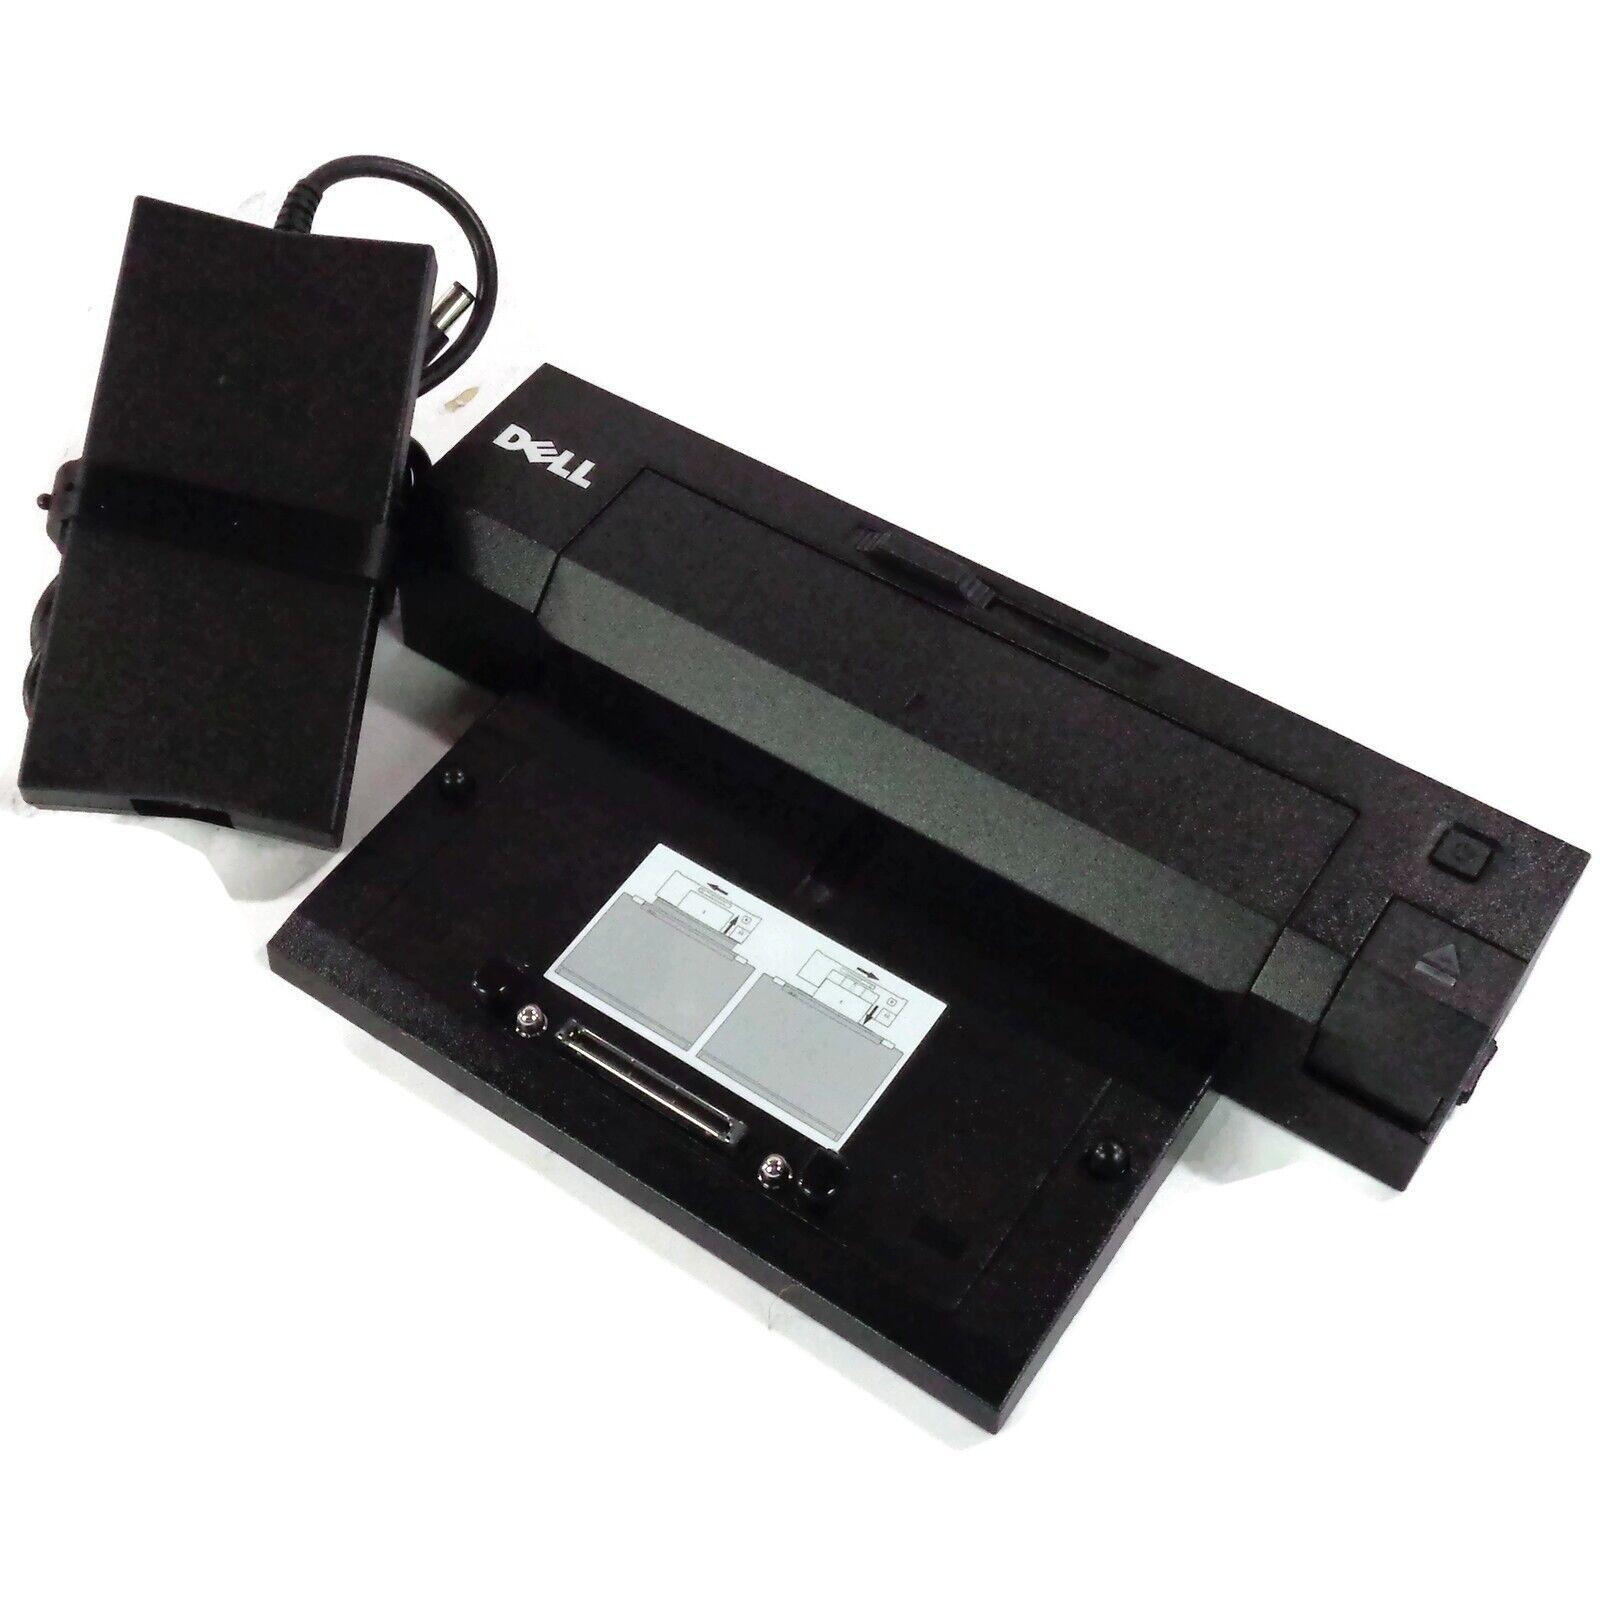 2.5 in TRASPARENTE USB3.0 HDD Case Tool Box Free uarf Telaio disco rigido QB ca. 6.35 cm